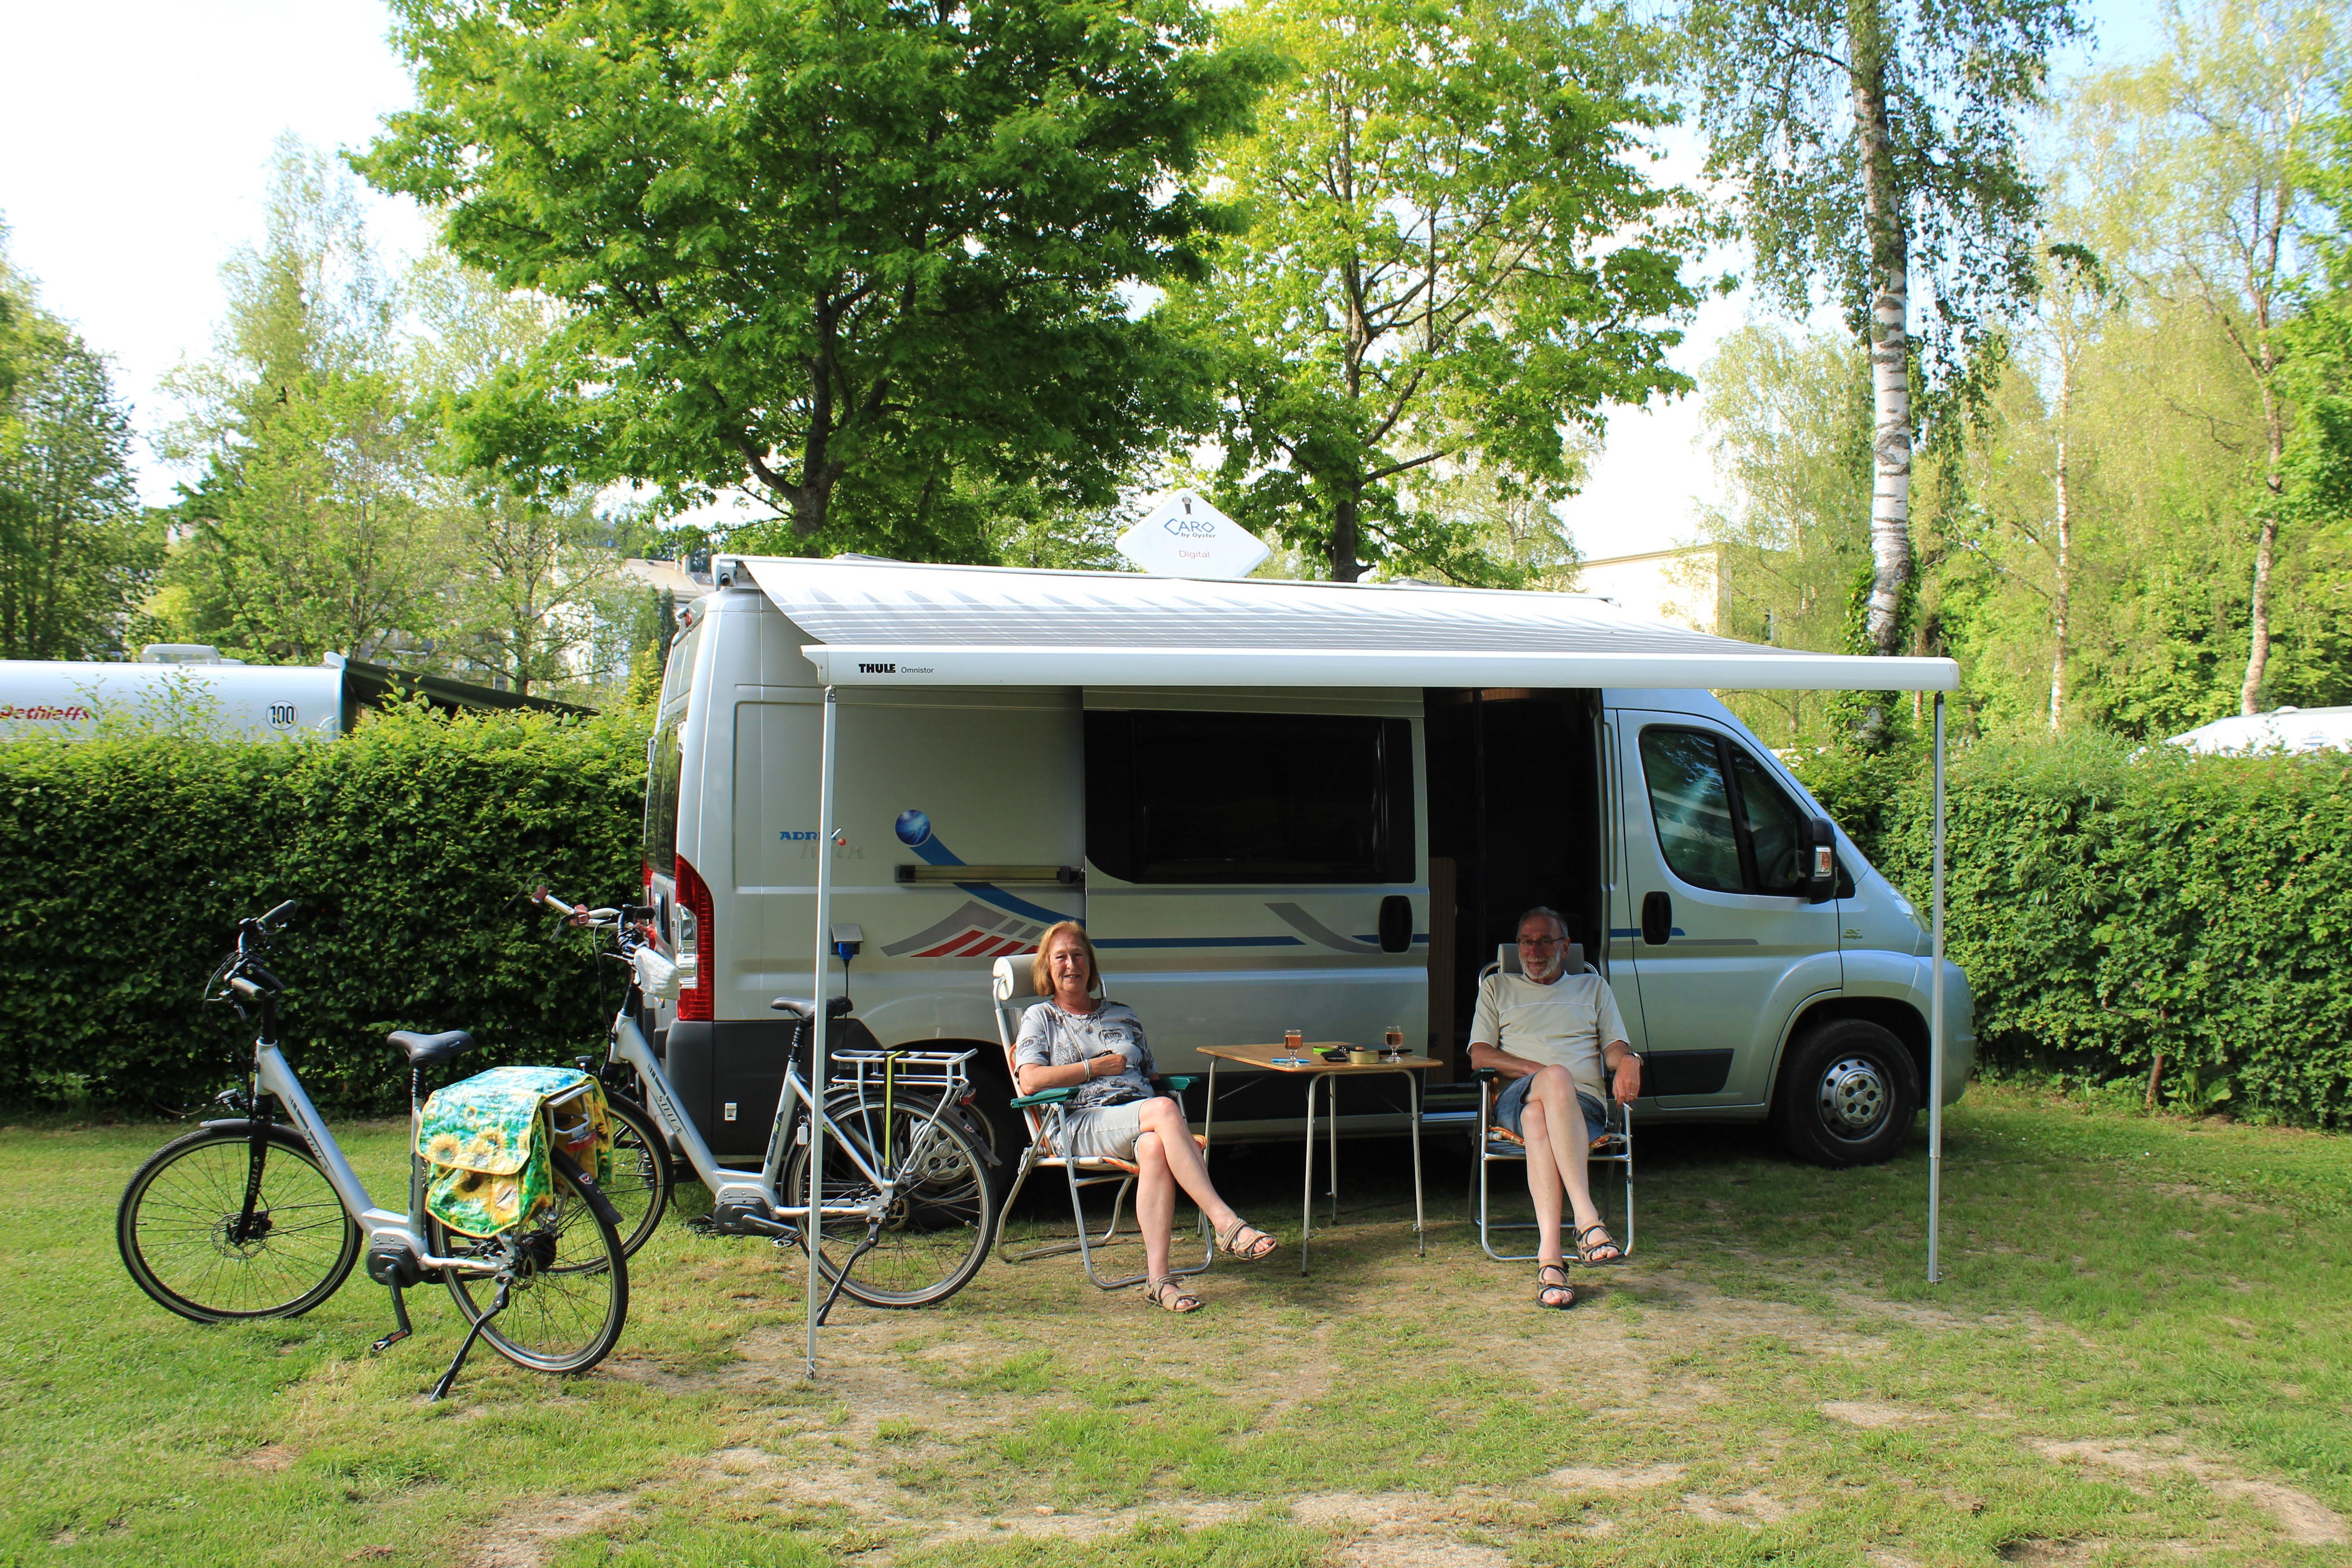 Standplaats kampeerauto incl. 1 persoon